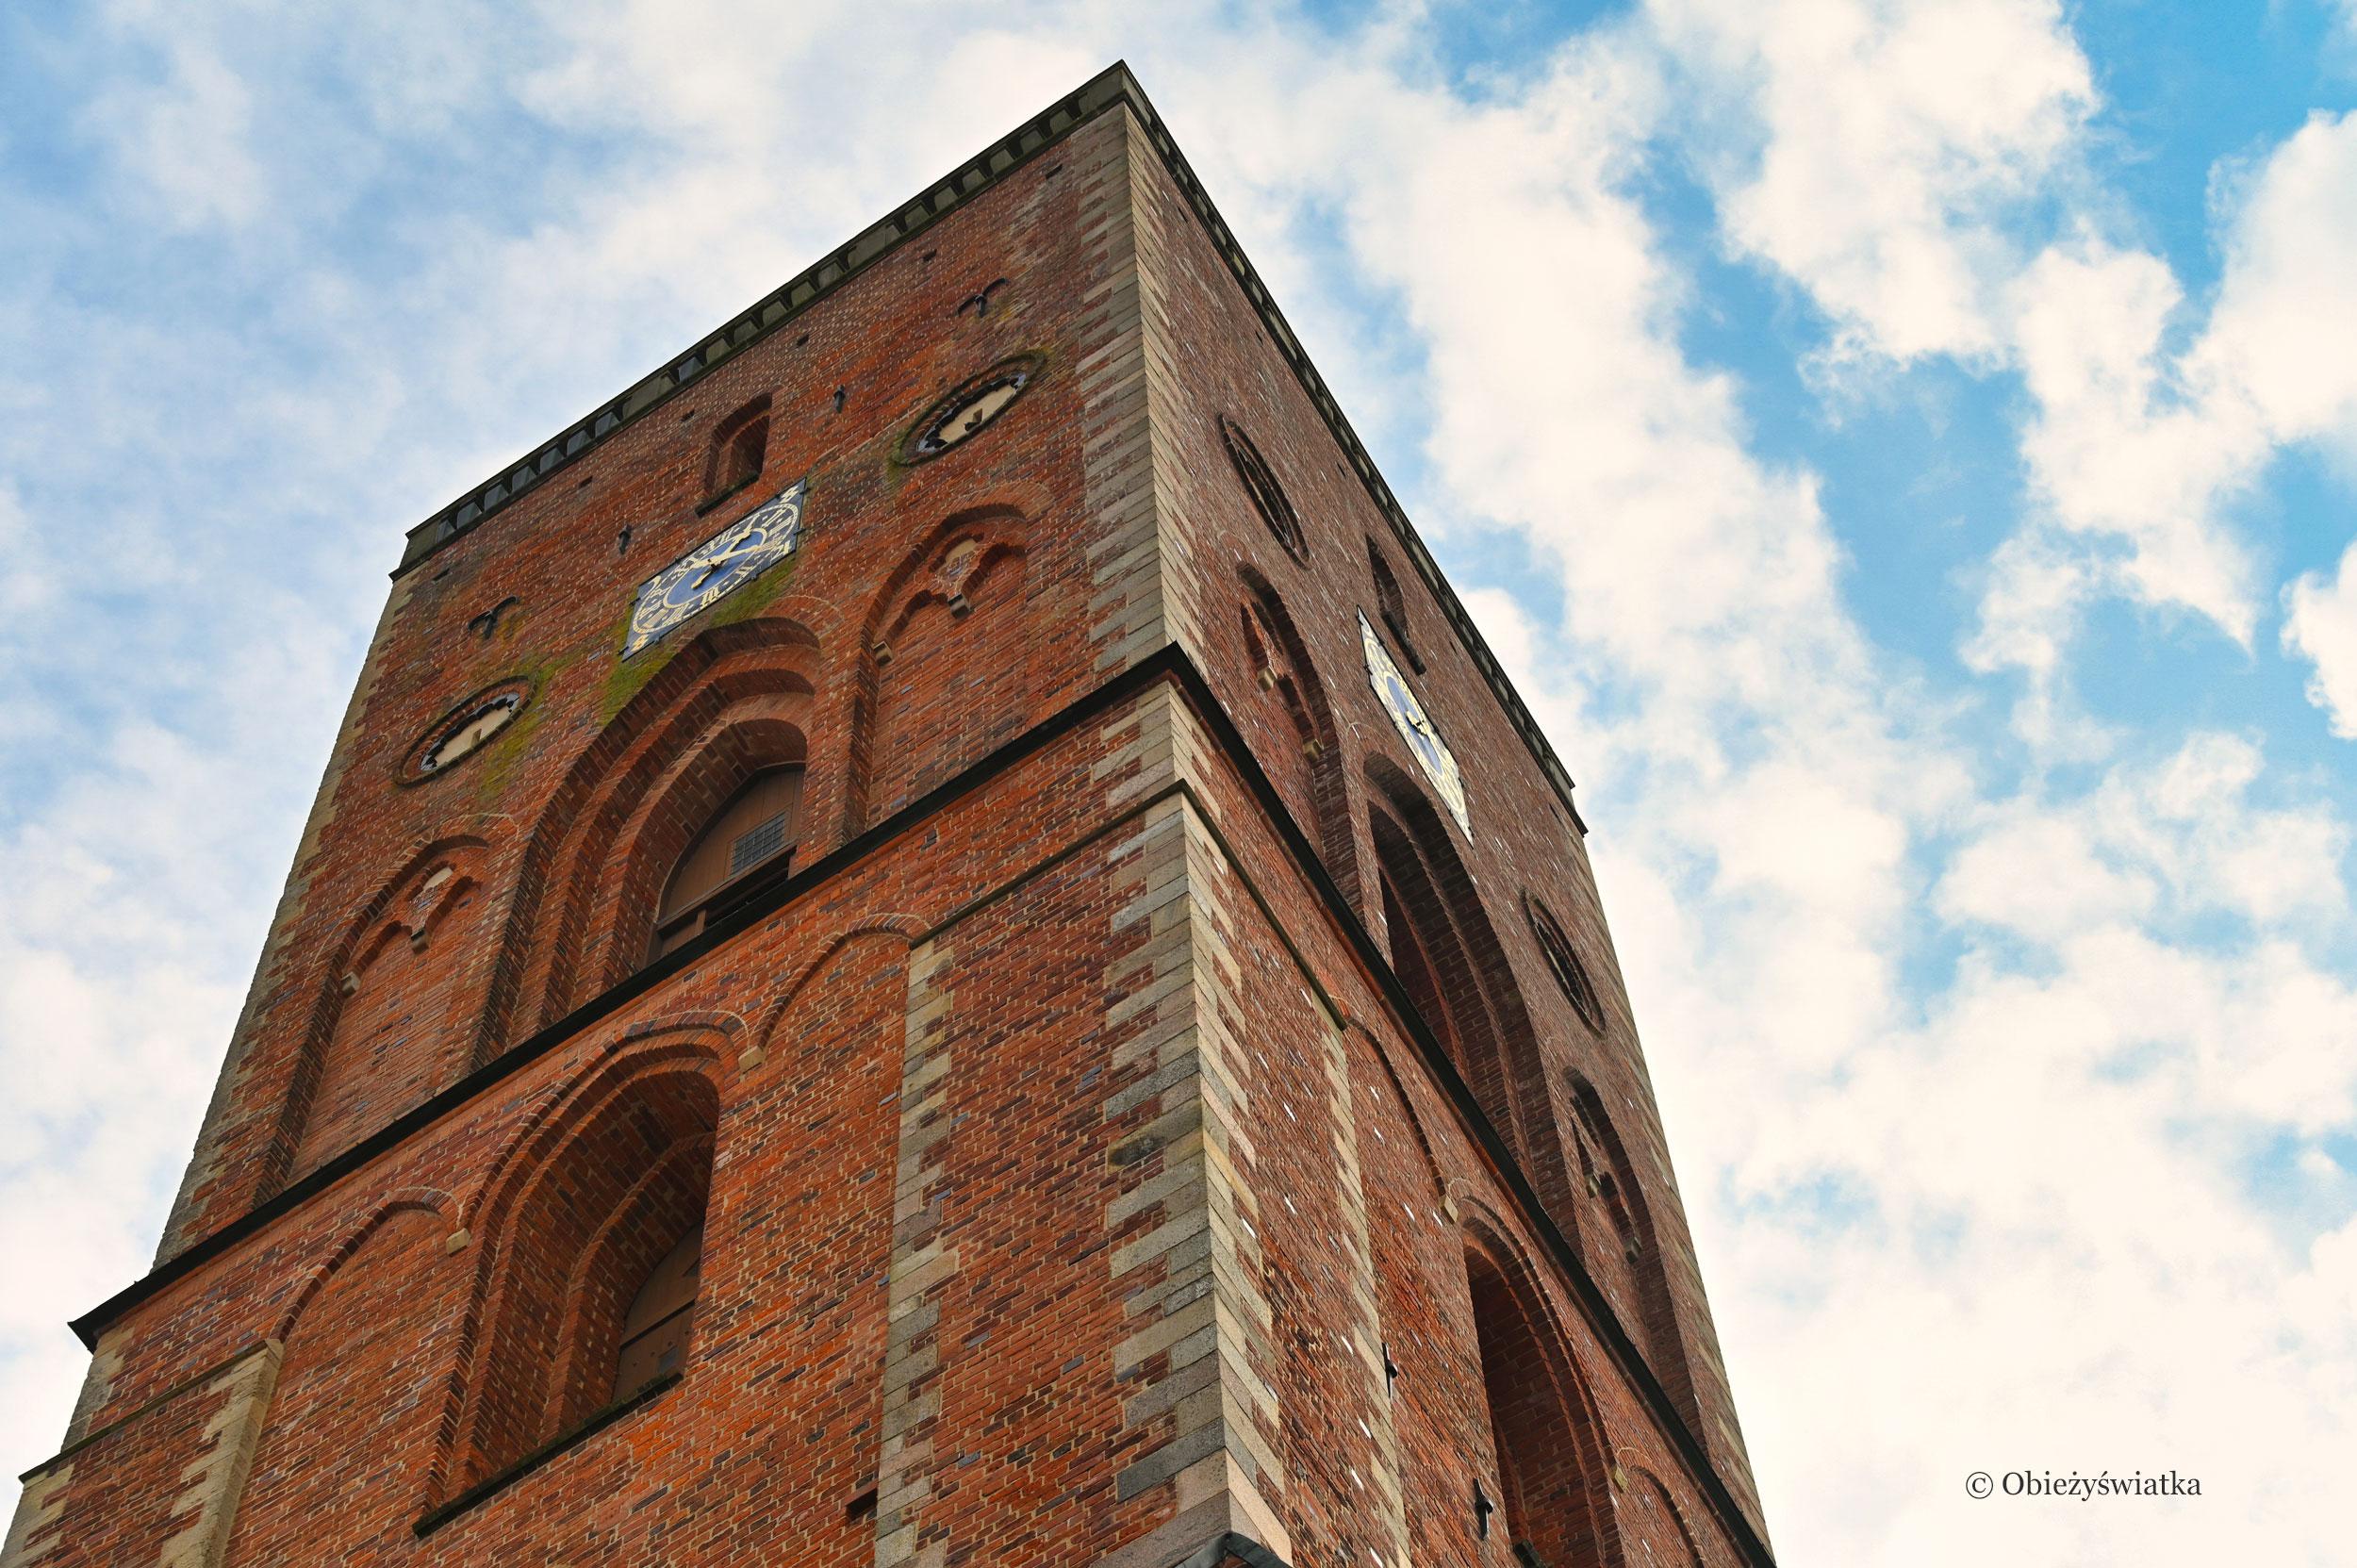 Katedra w Ribe, Dania